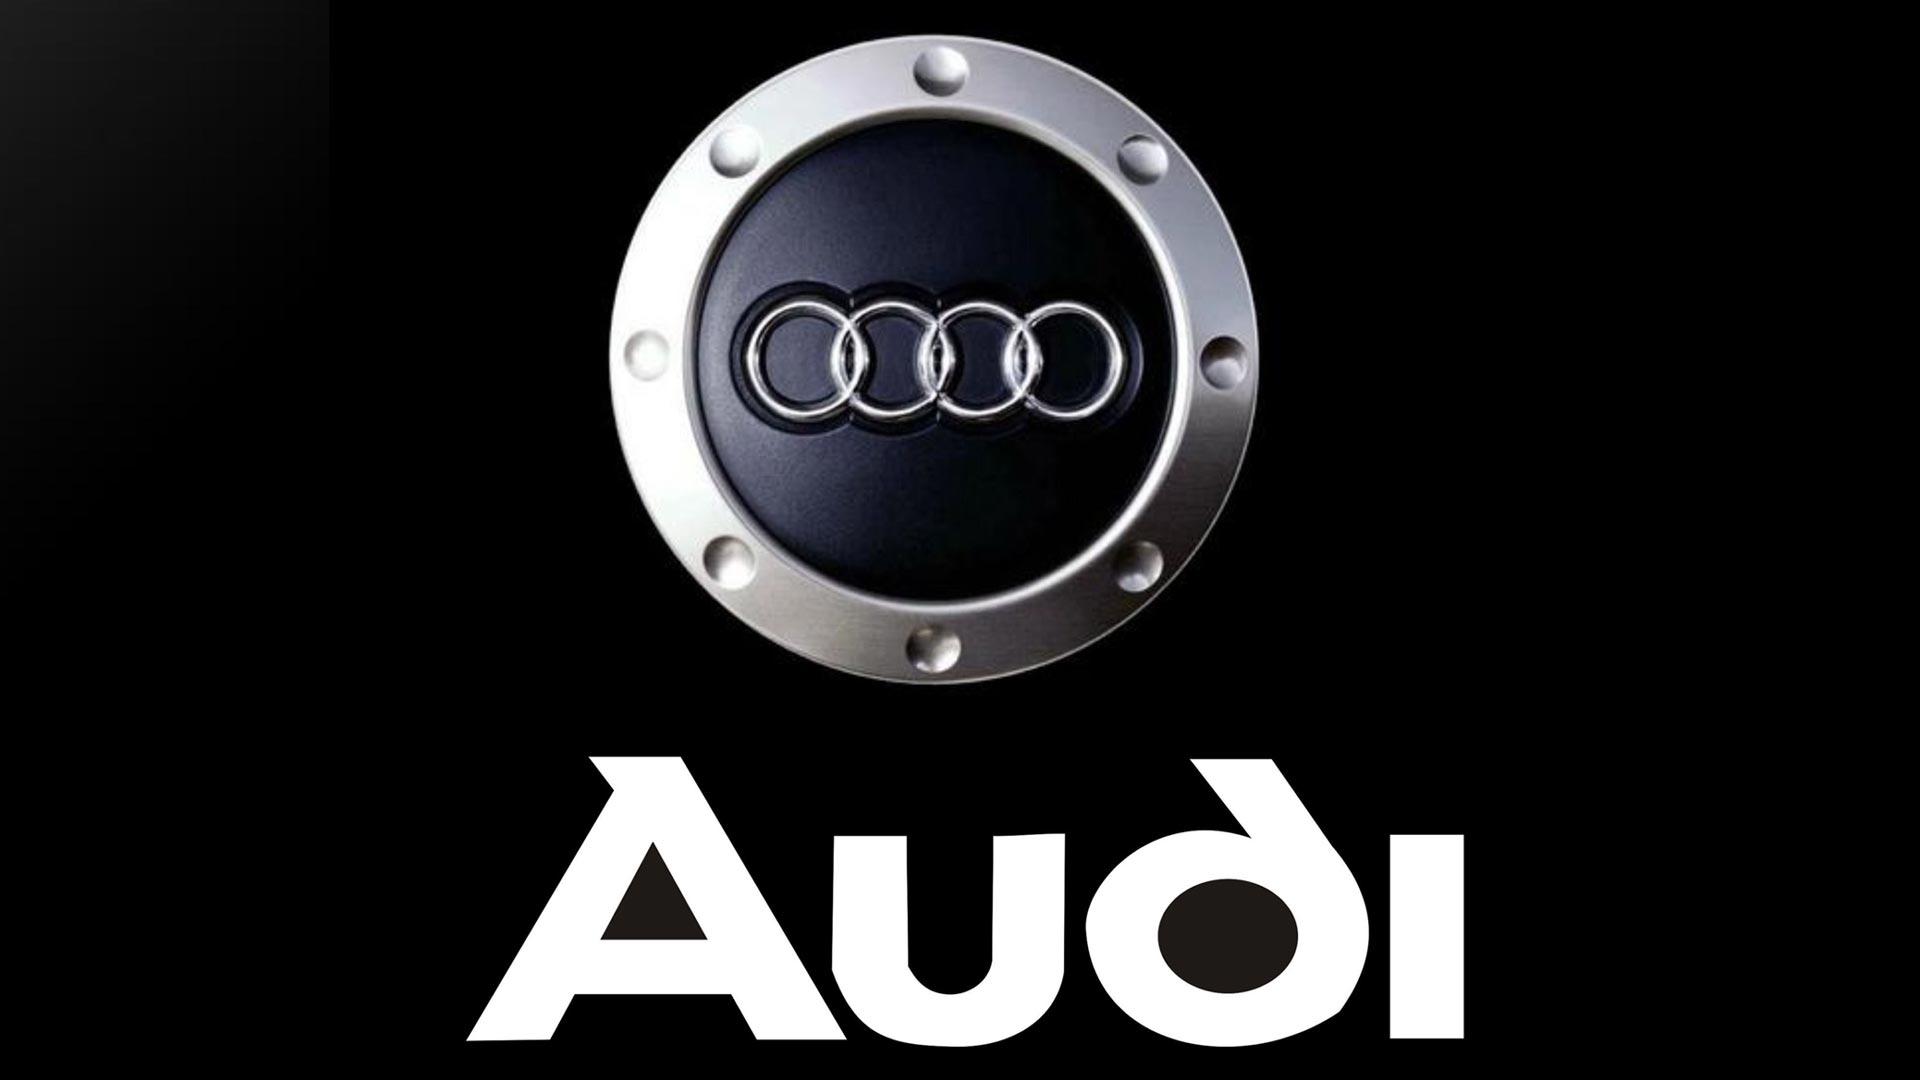 Audi Logo Wallpapers Pictures Images - Audi car symbol